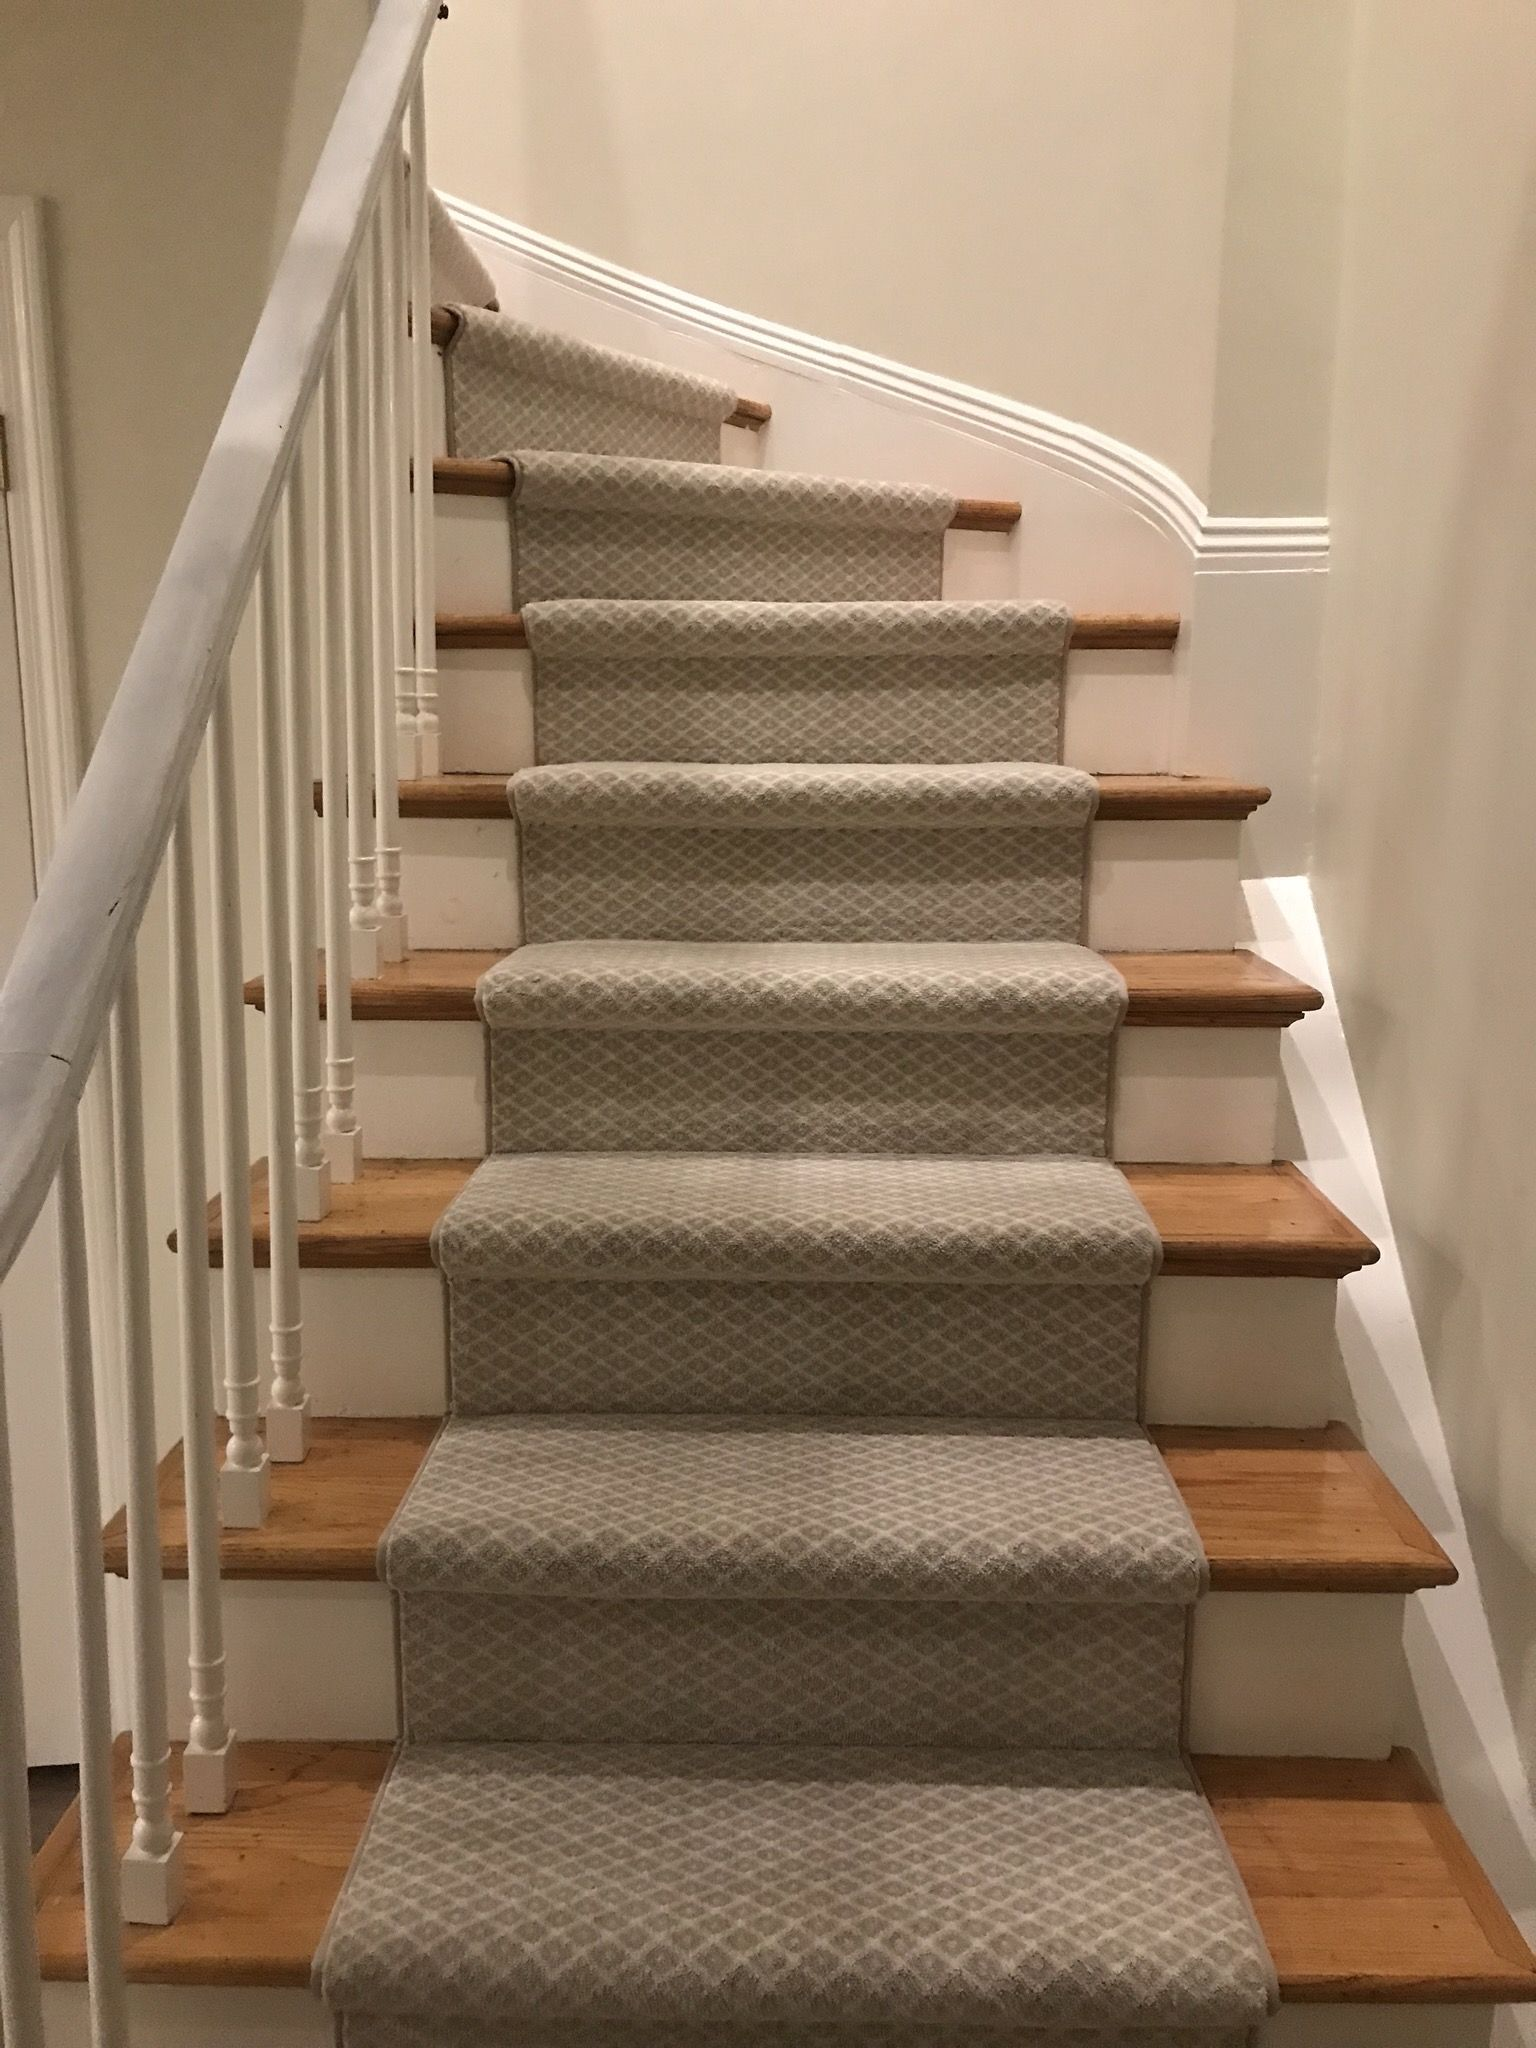 Boston Newyork Wool Plush Stair Stairrunner Runner Modern   Modern Carpet Runners For Stairs   Step Sculptured Color   Pinterest   Curved   Light Grey   Victorian